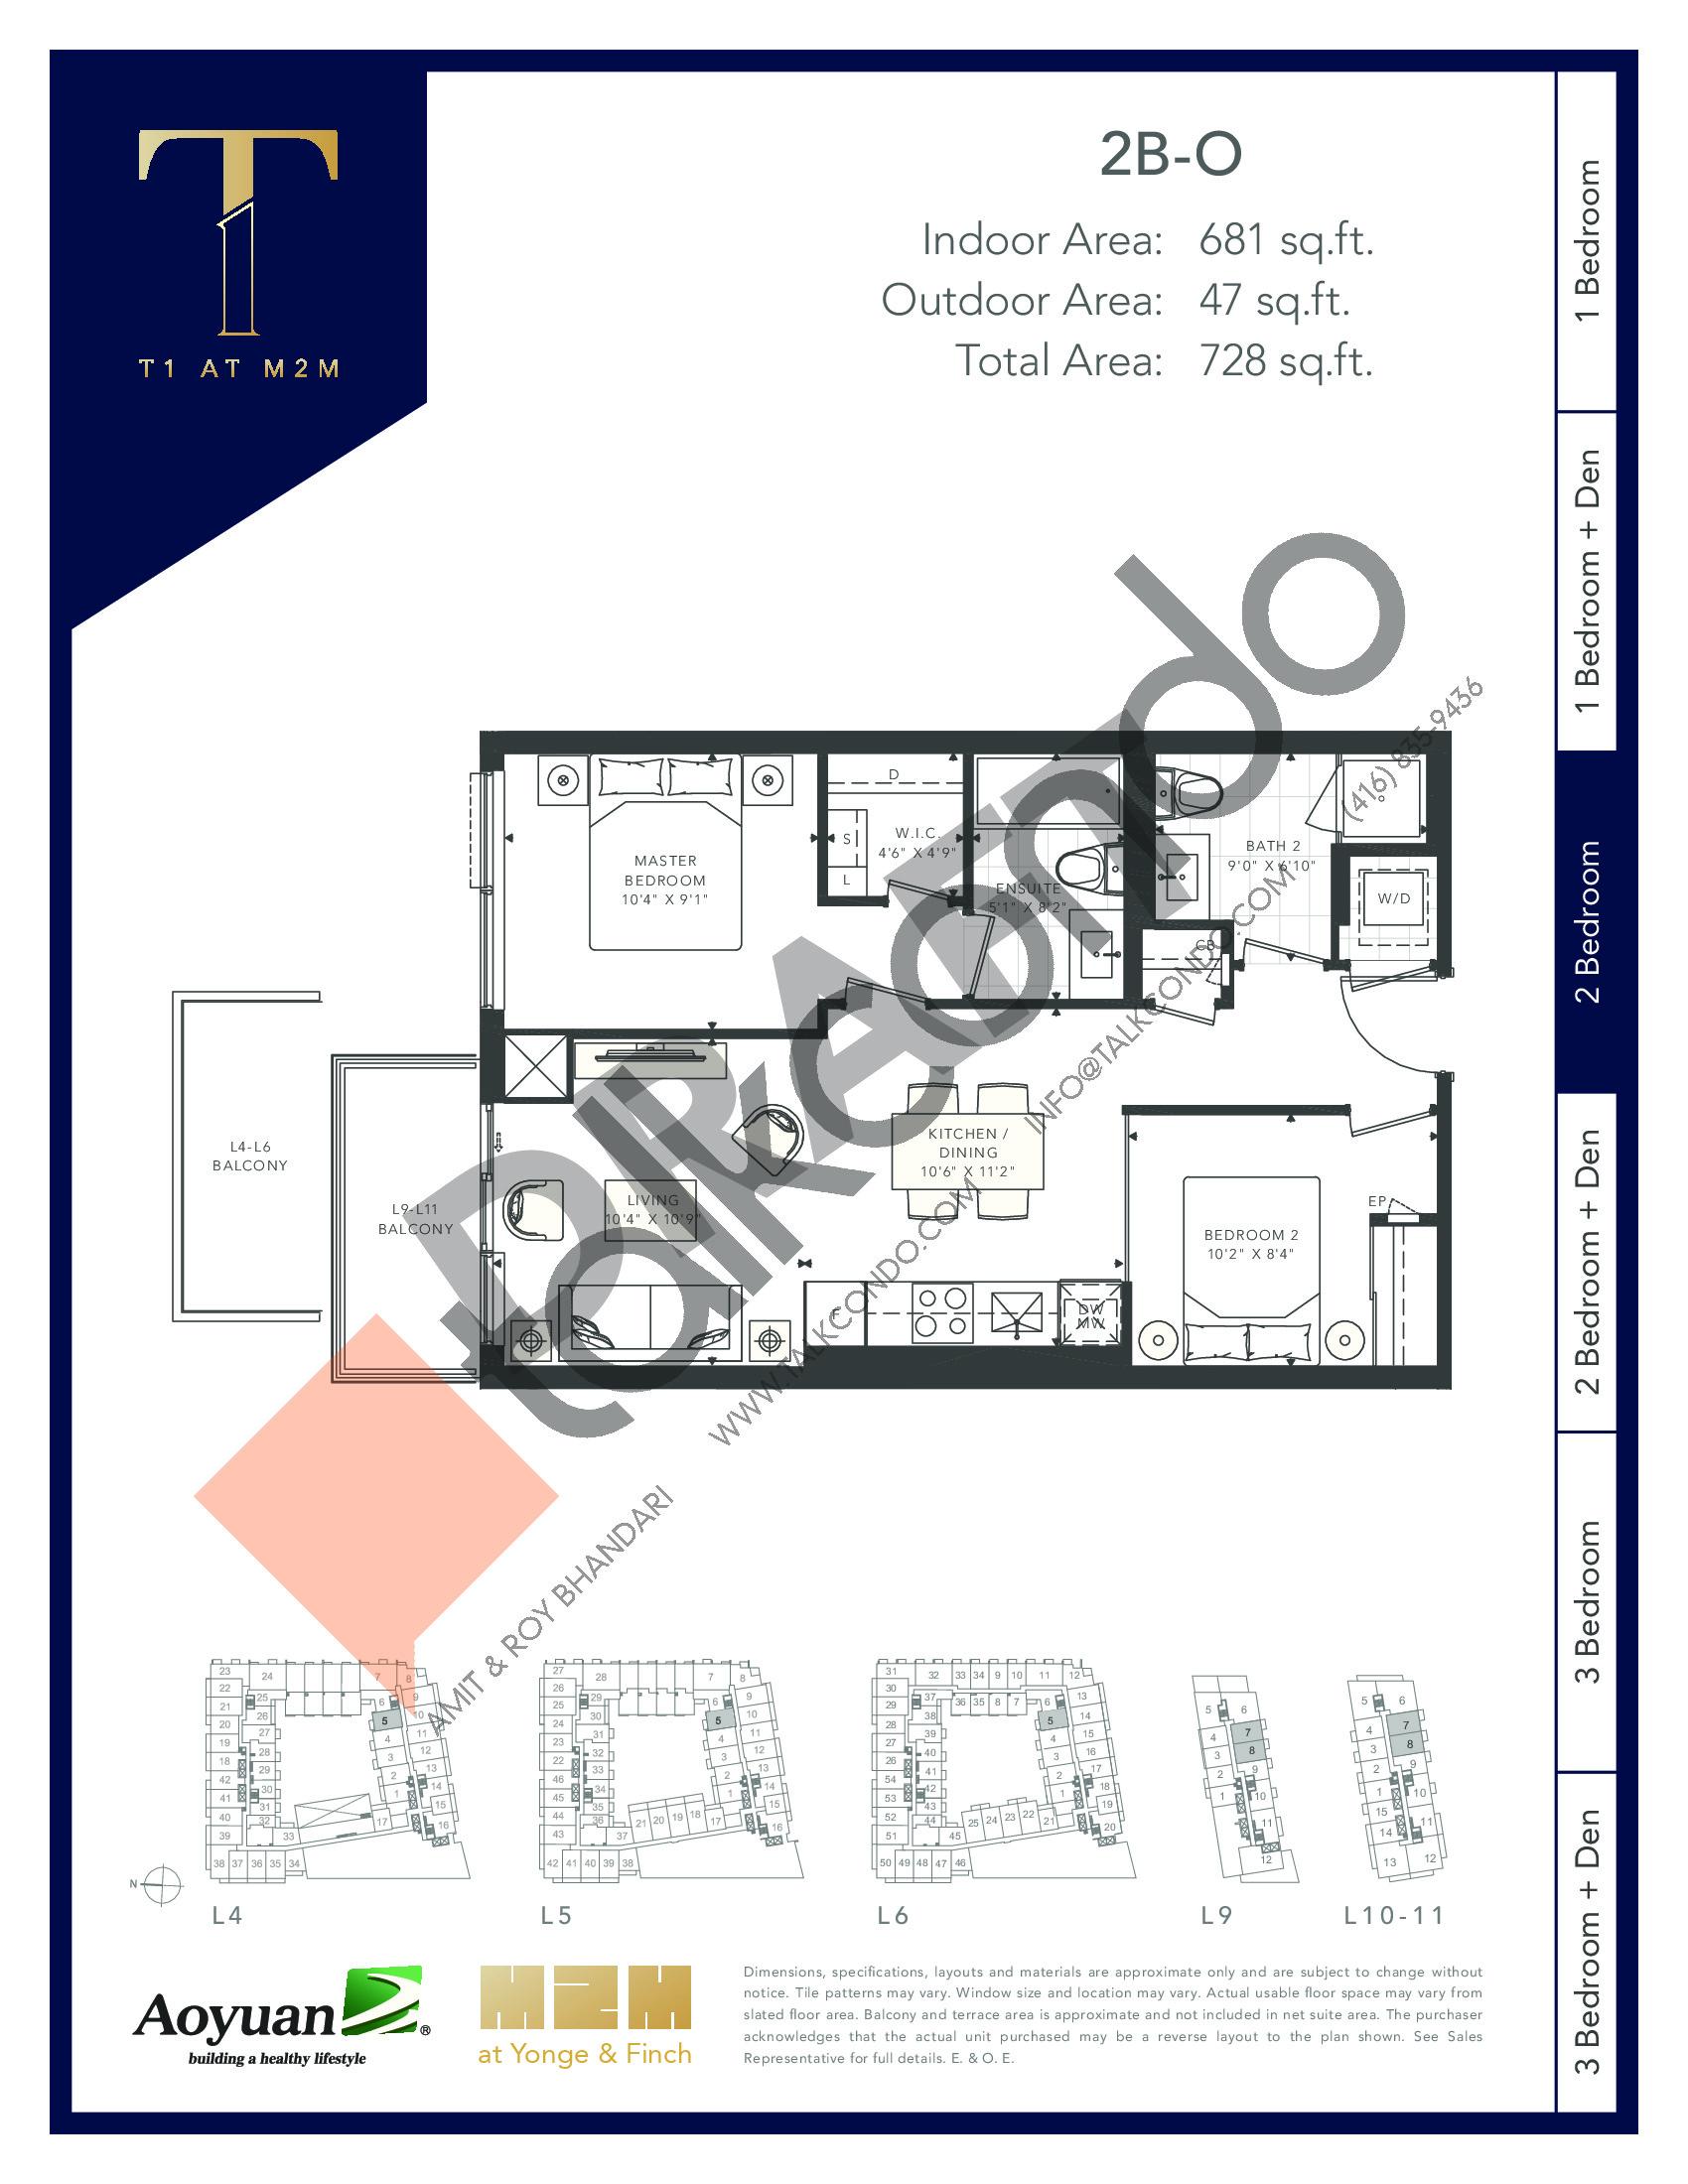 2B-O (Podium) Floor Plan at T1 at M2M Condos - 681 sq.ft